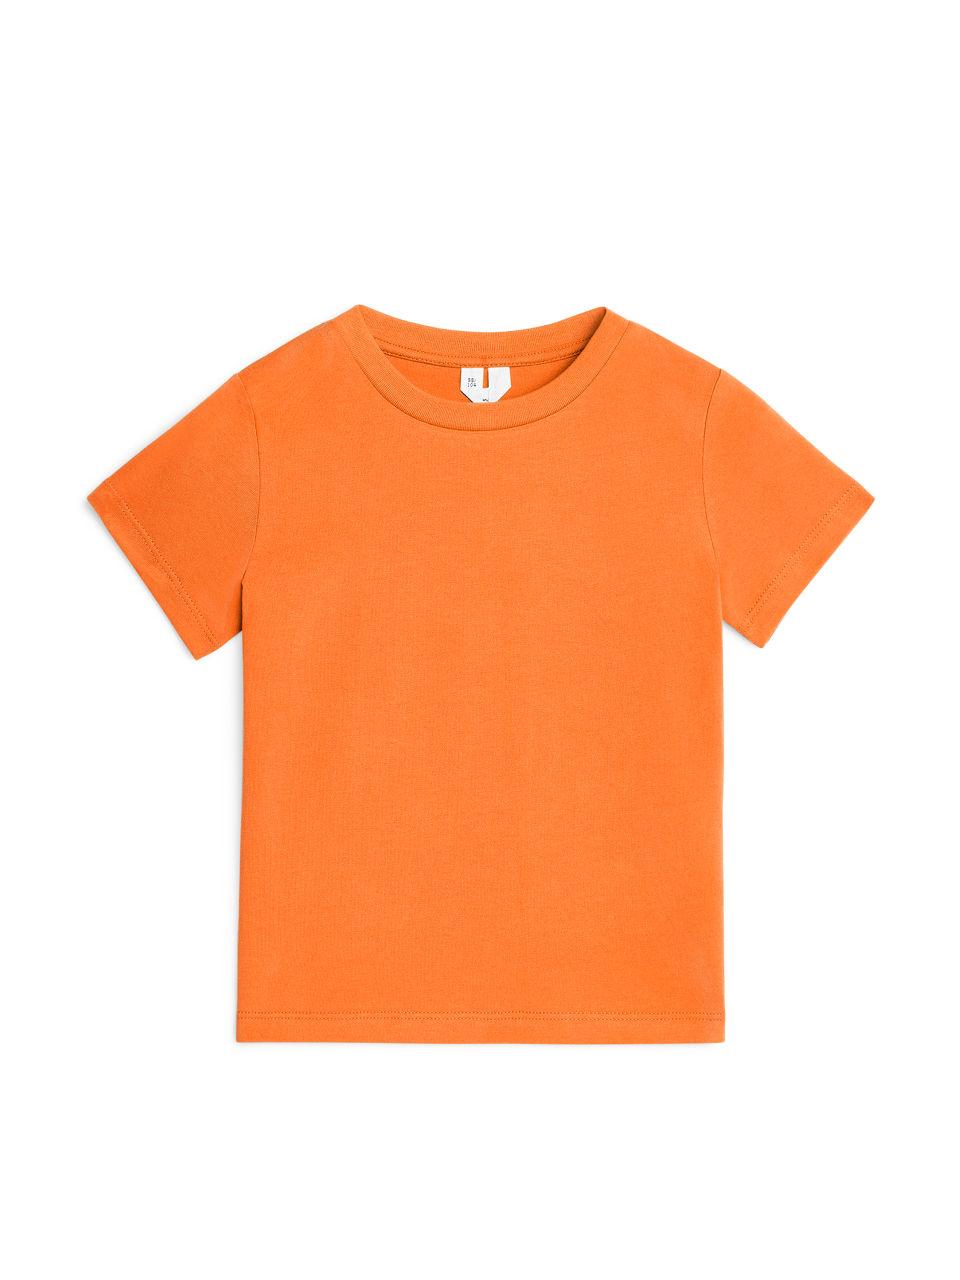 Crew-Neck T-shirt - Orange